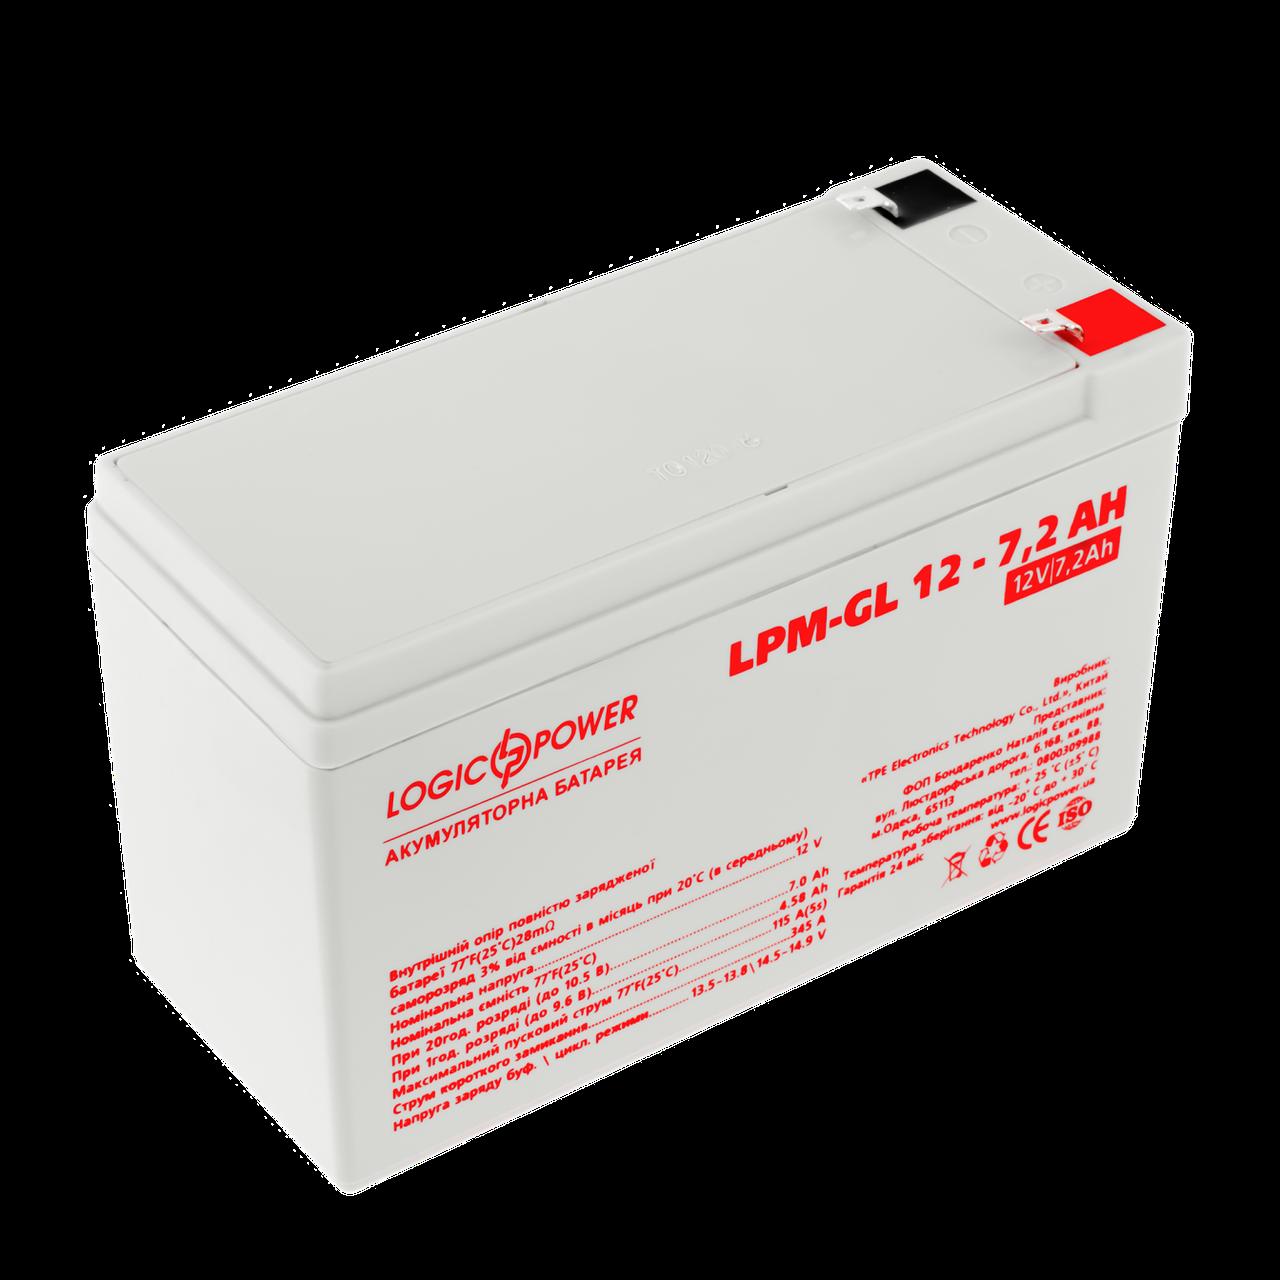 Аккумулятор гелевый LogicPower LPM-GL 12 - 7.2 AH